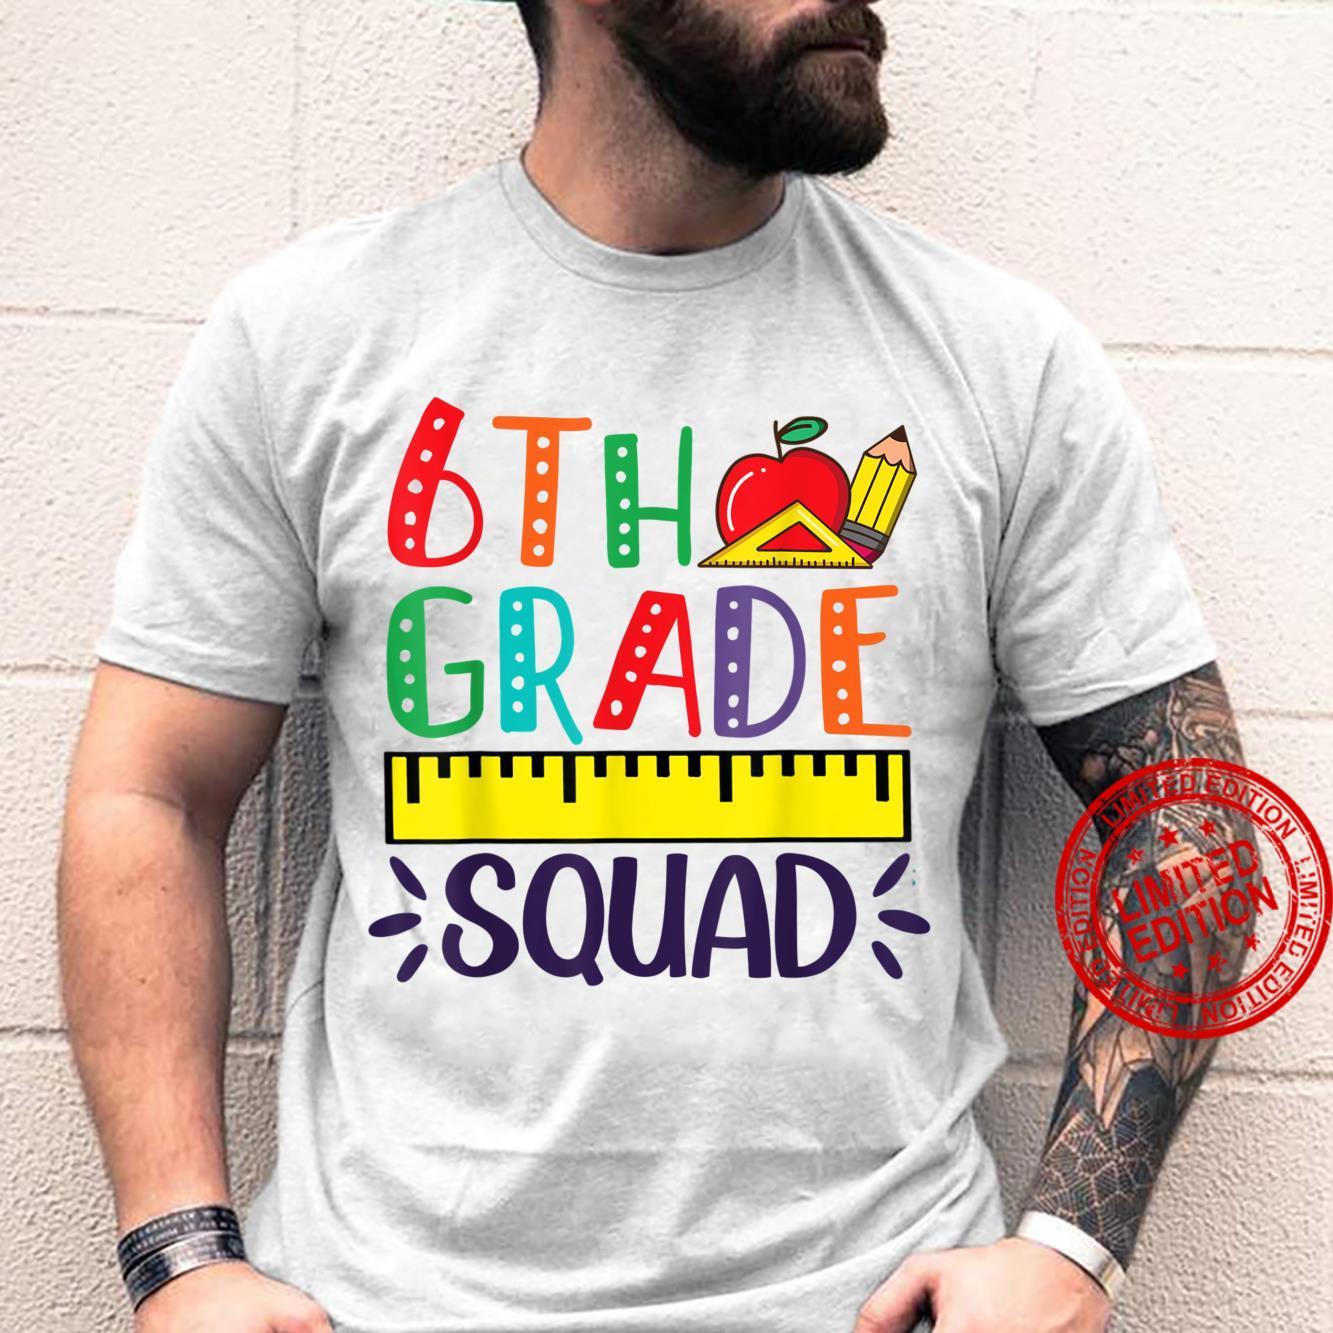 6th Grade Squad Teacher Student Back To School Shirt